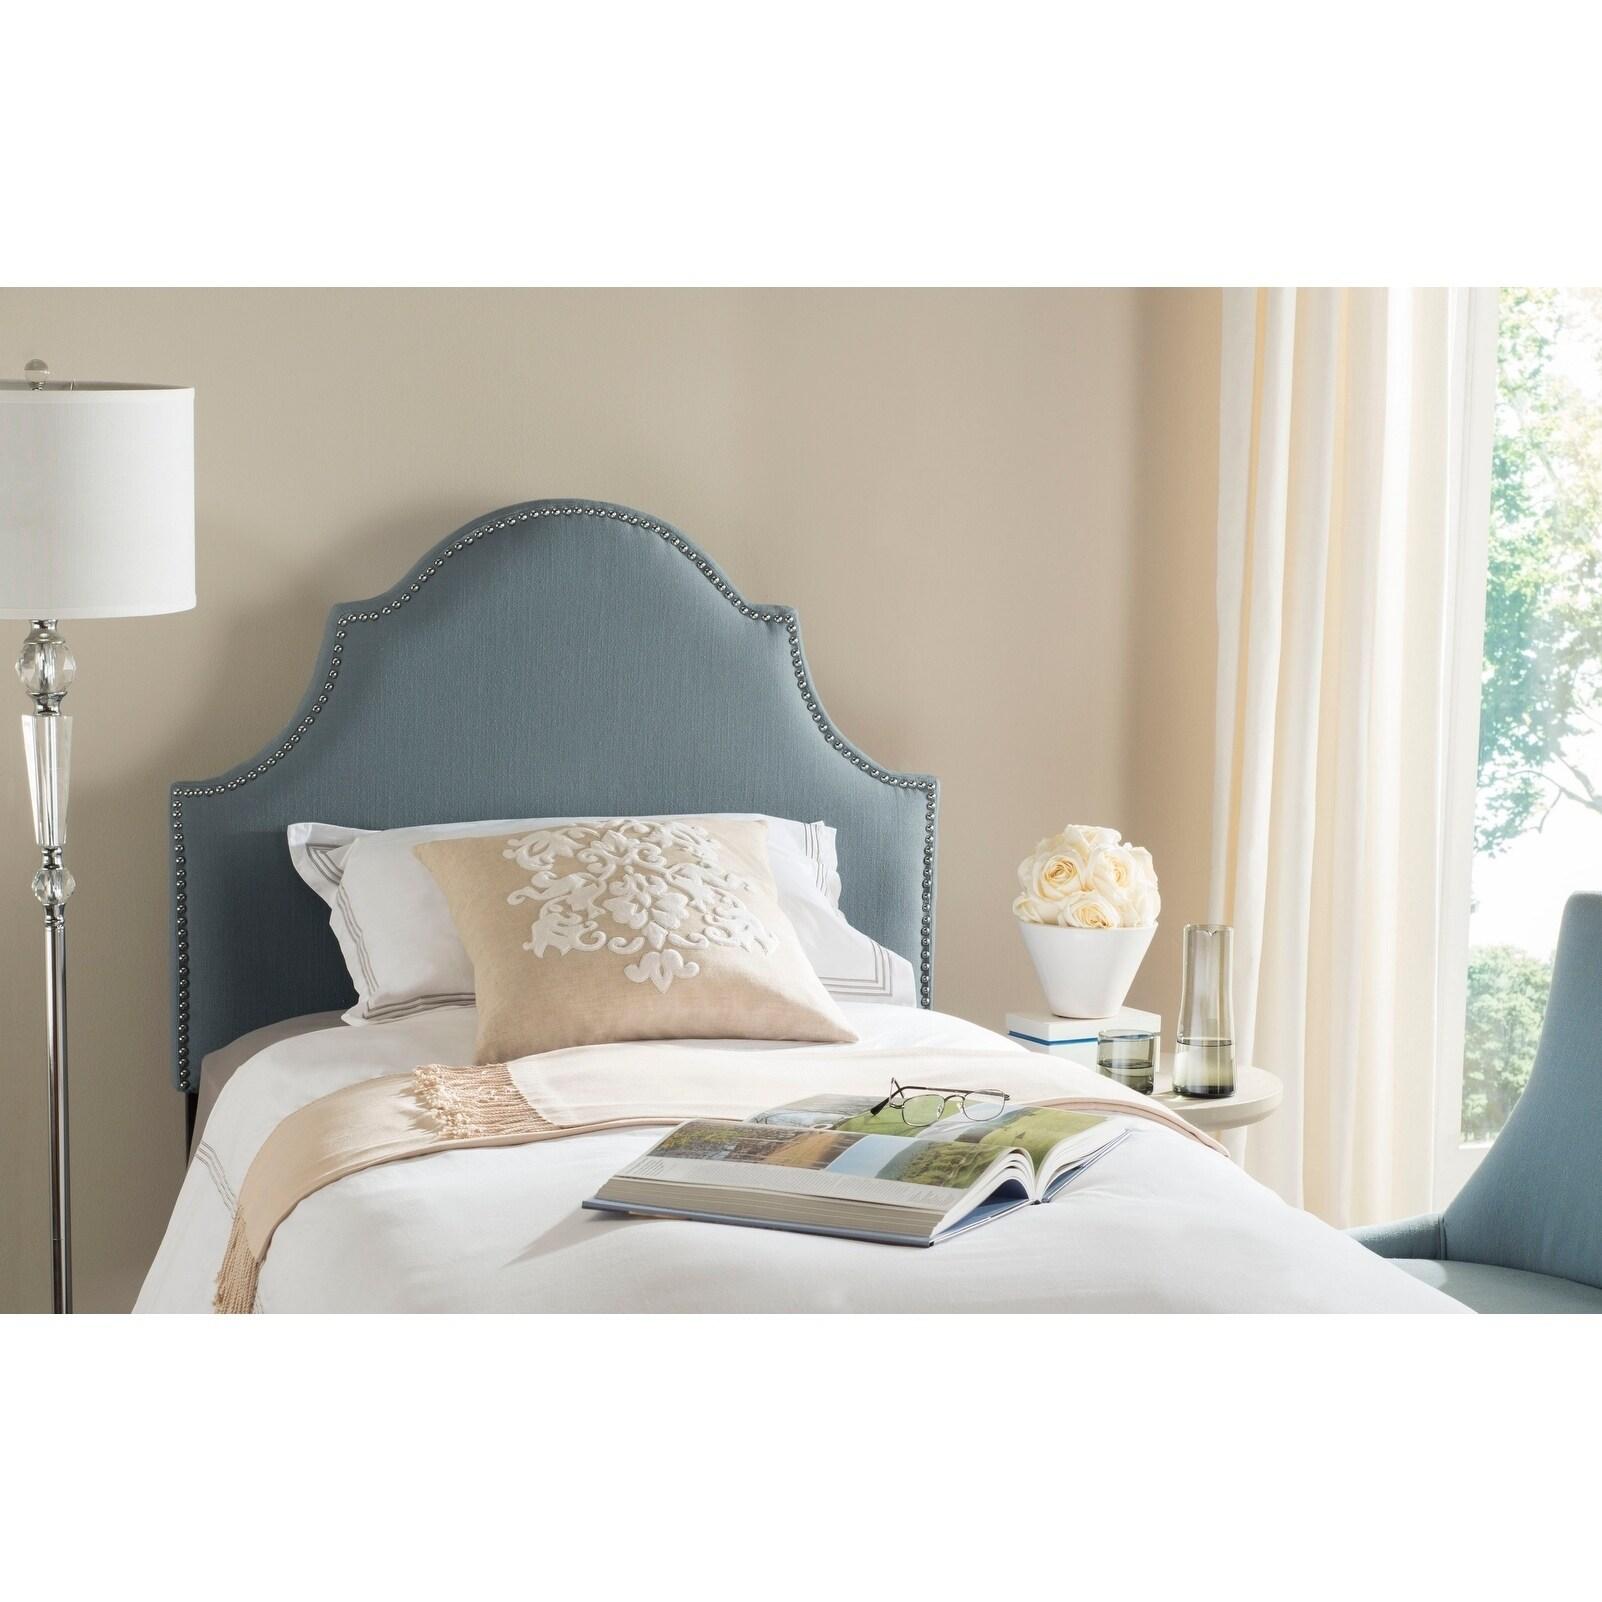 Safavieh Hallmar Sky Blue Upholstered Arched Headboard - Silver Nailhead (Twin) (MCR4026D)